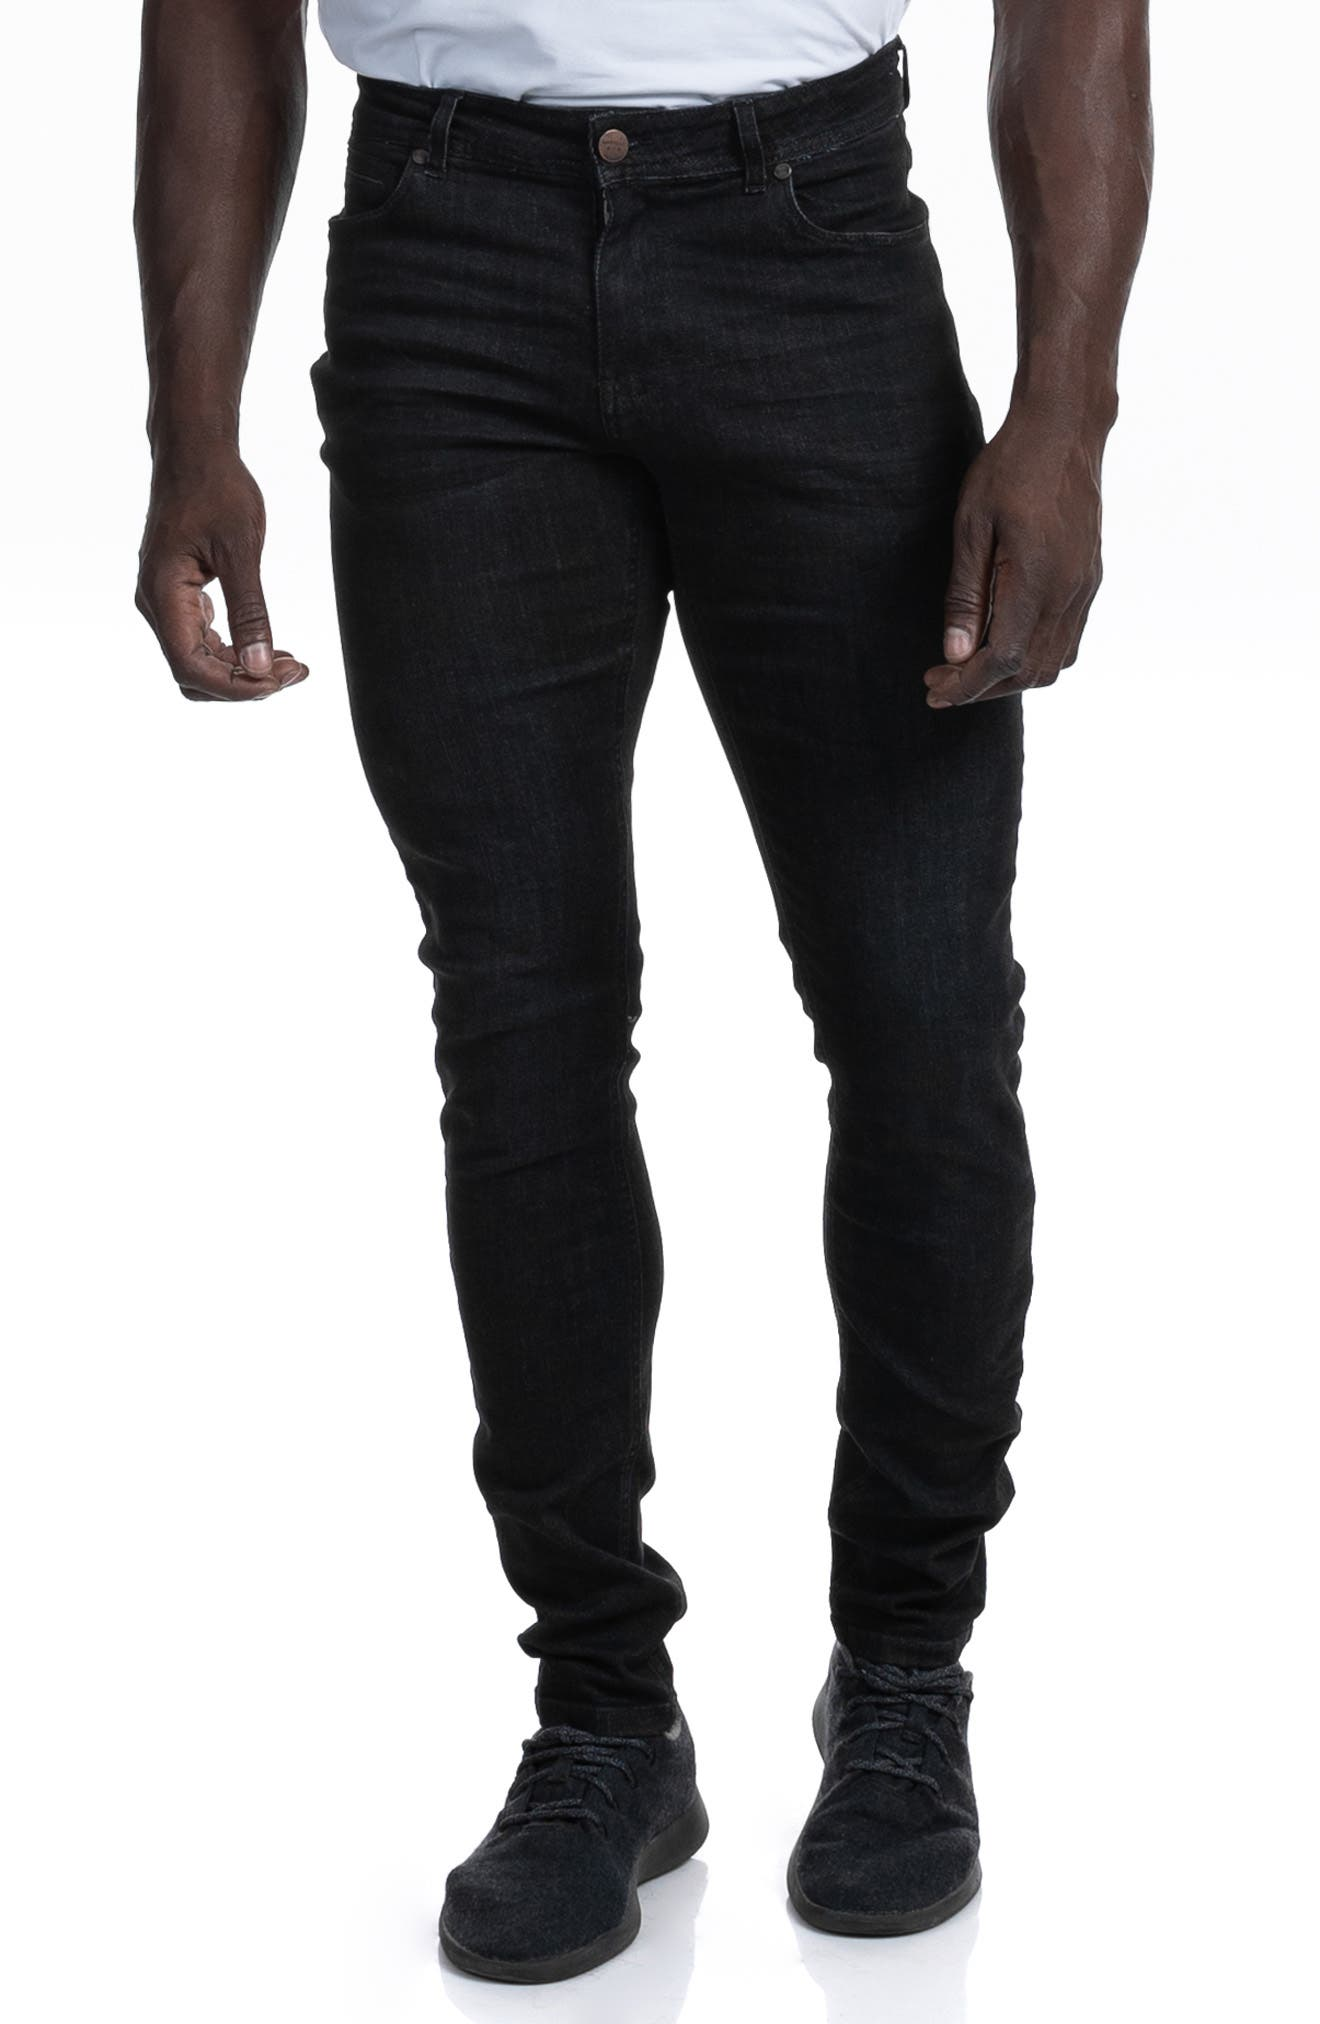 Slim Athletic Fit Jeans